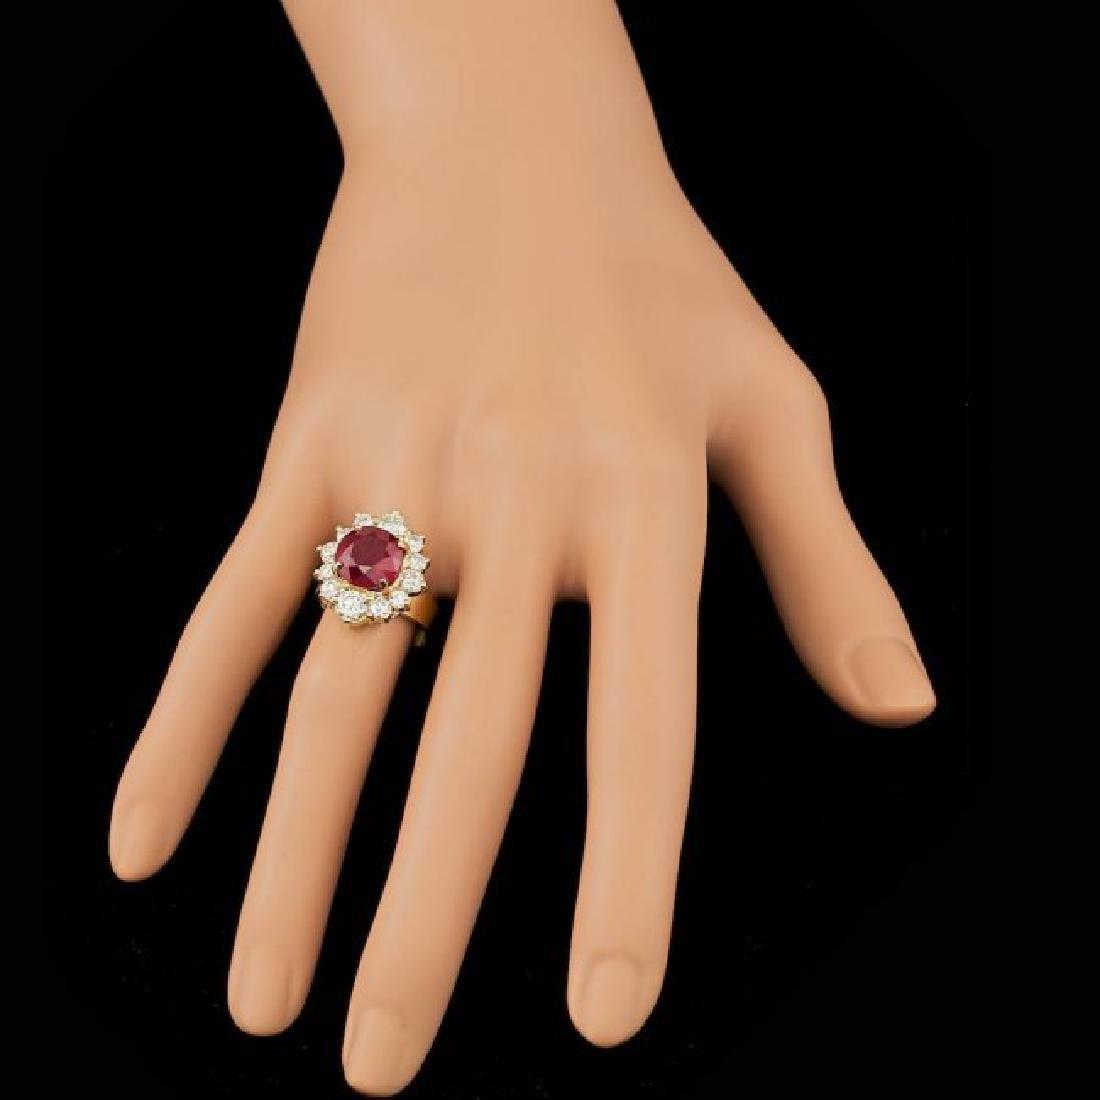 14k Yellow Gold 5.50ct Ruby 1.85ct Diamond Ring - 4